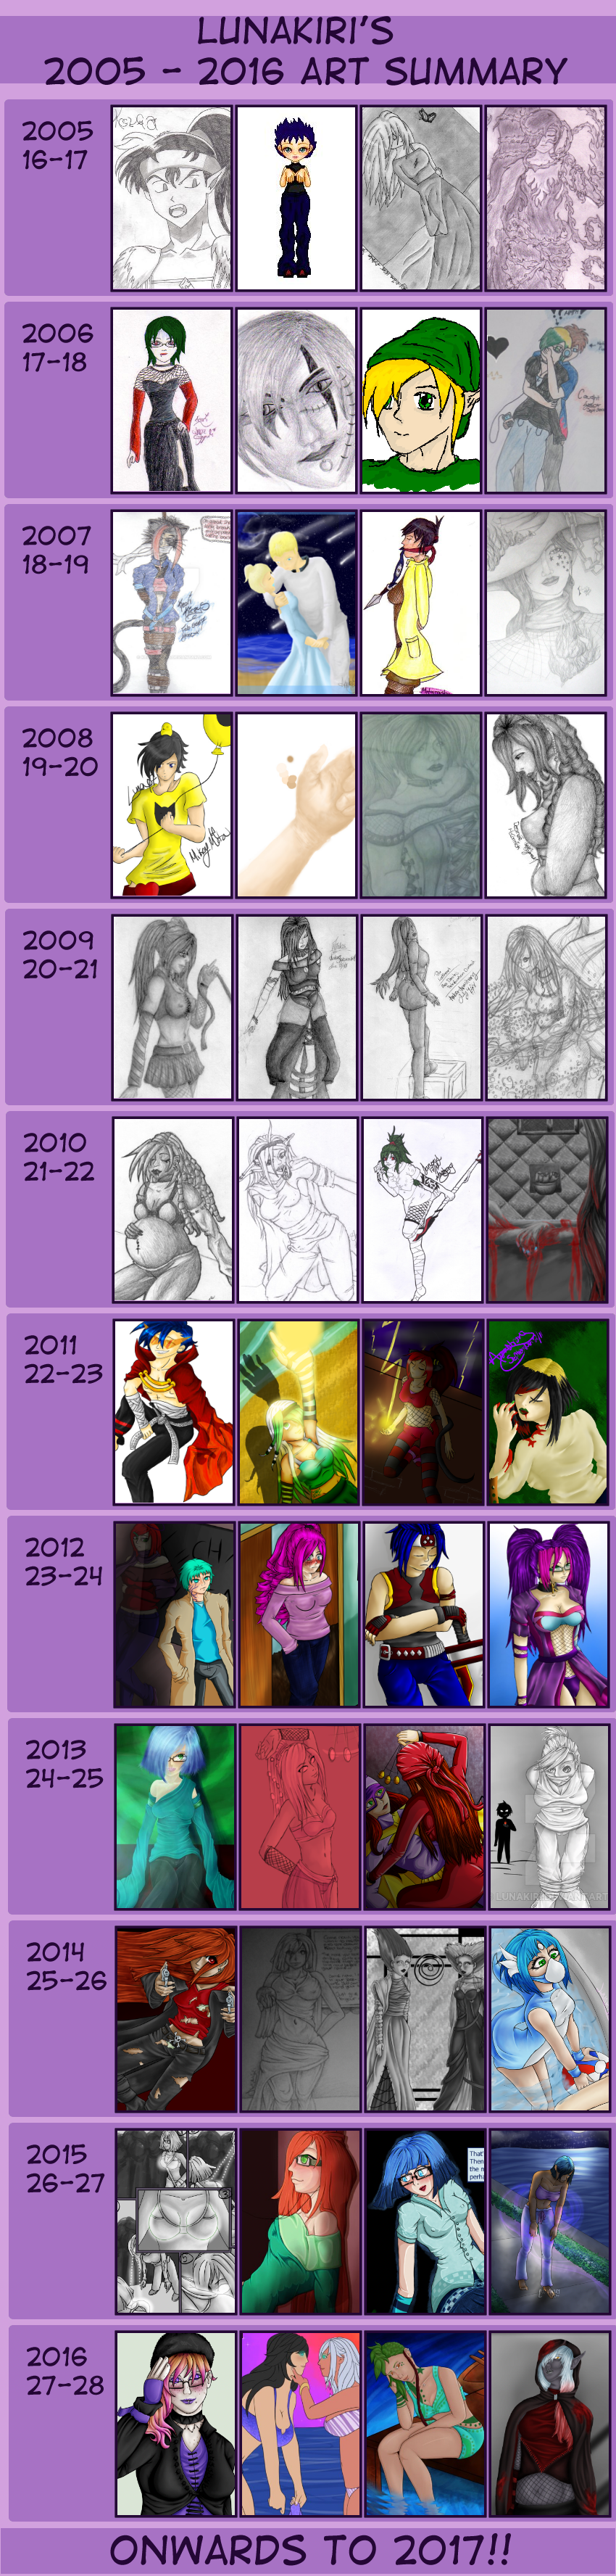 Art Summary - 2oo5-2o16 by Lunakiri